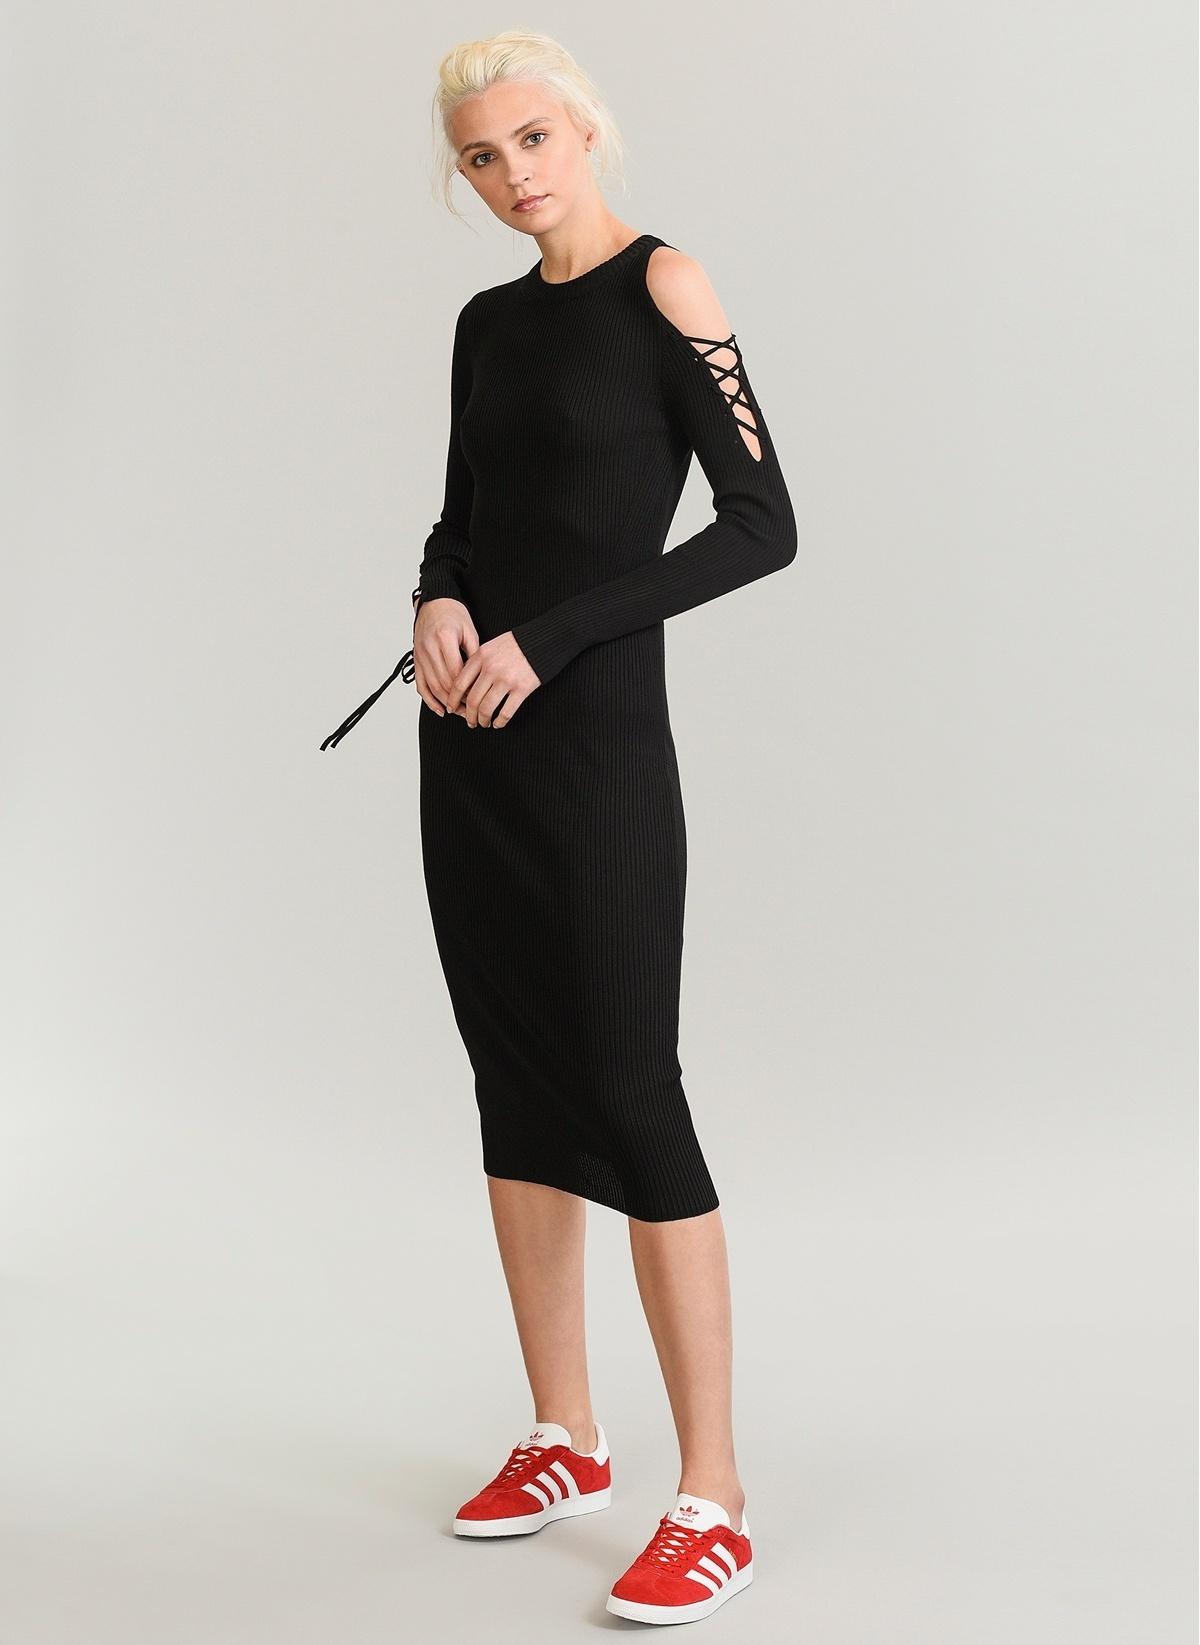 59ddcd689a547 People By Fabrika Kadın Omuz Detaylı Triko Elbise Siyah   Morhipo ...